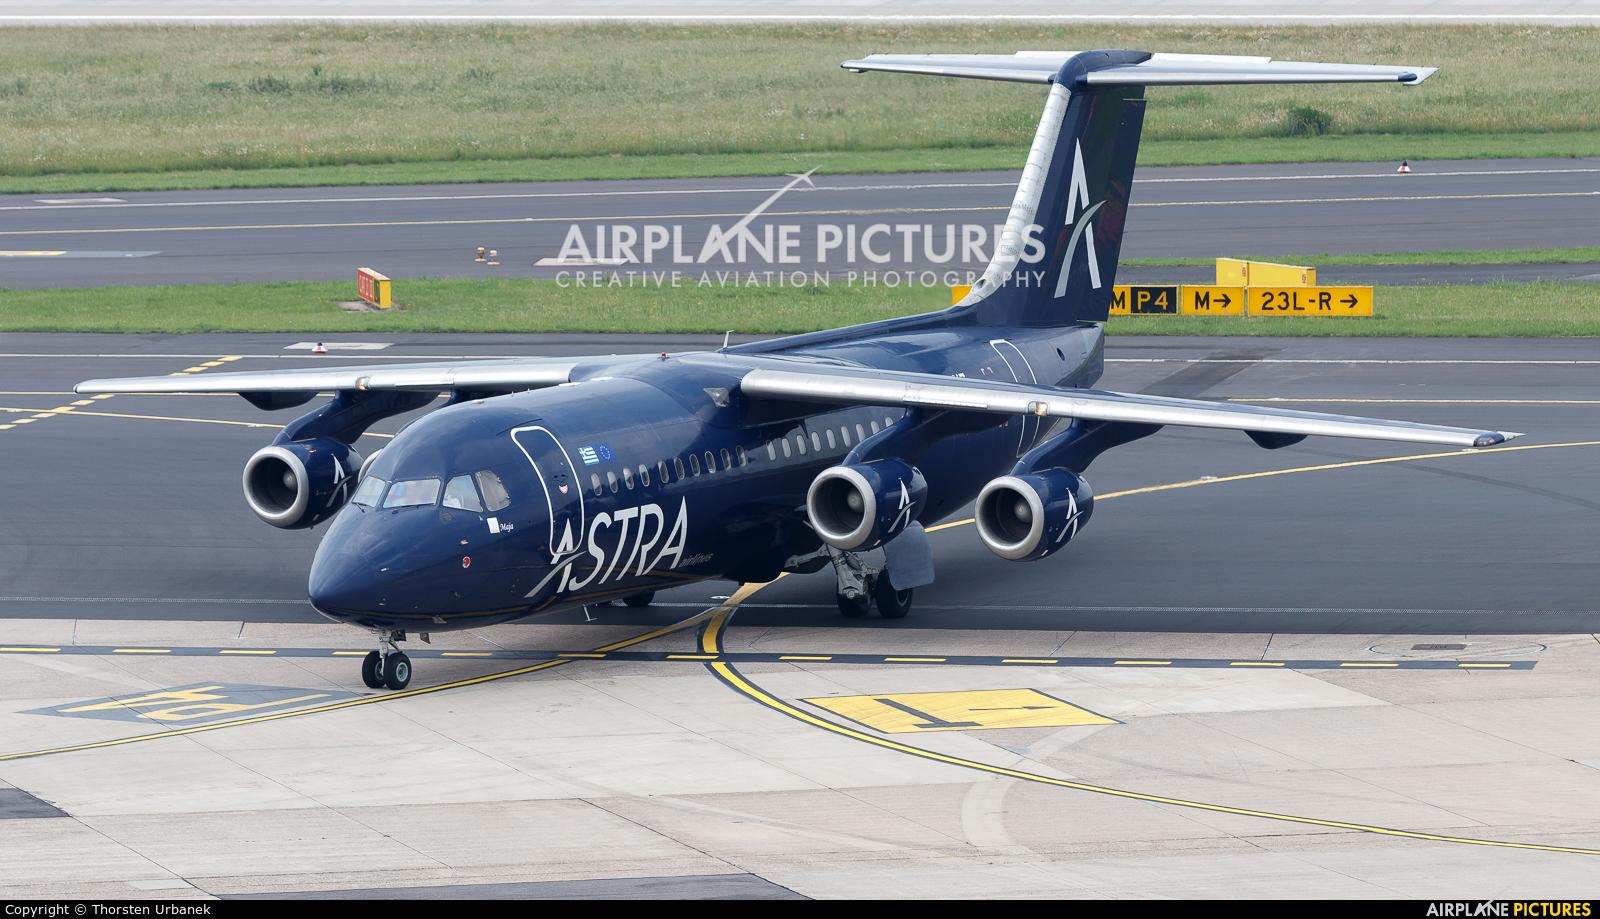 Astra Airlines SX-DIZ aircraft at Düsseldorf